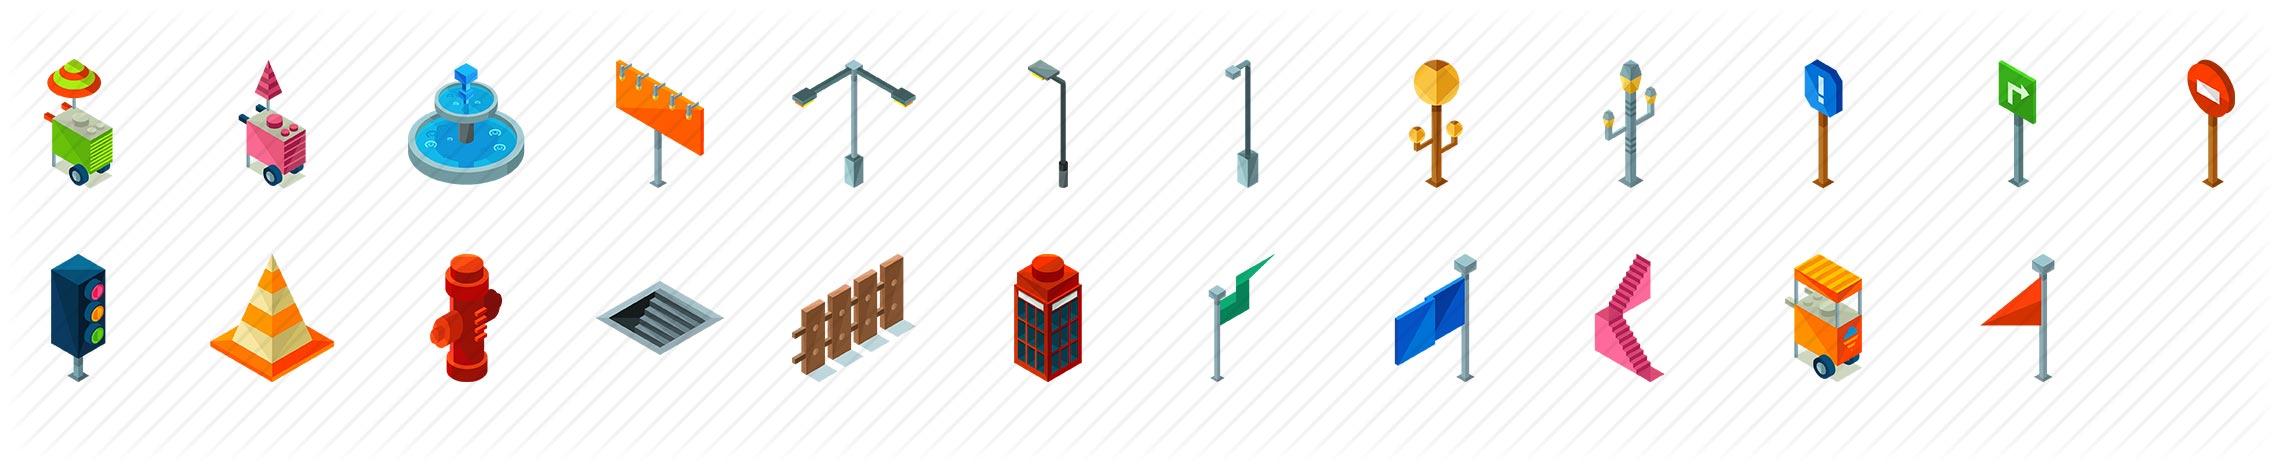 Street Elements Isometric Icons